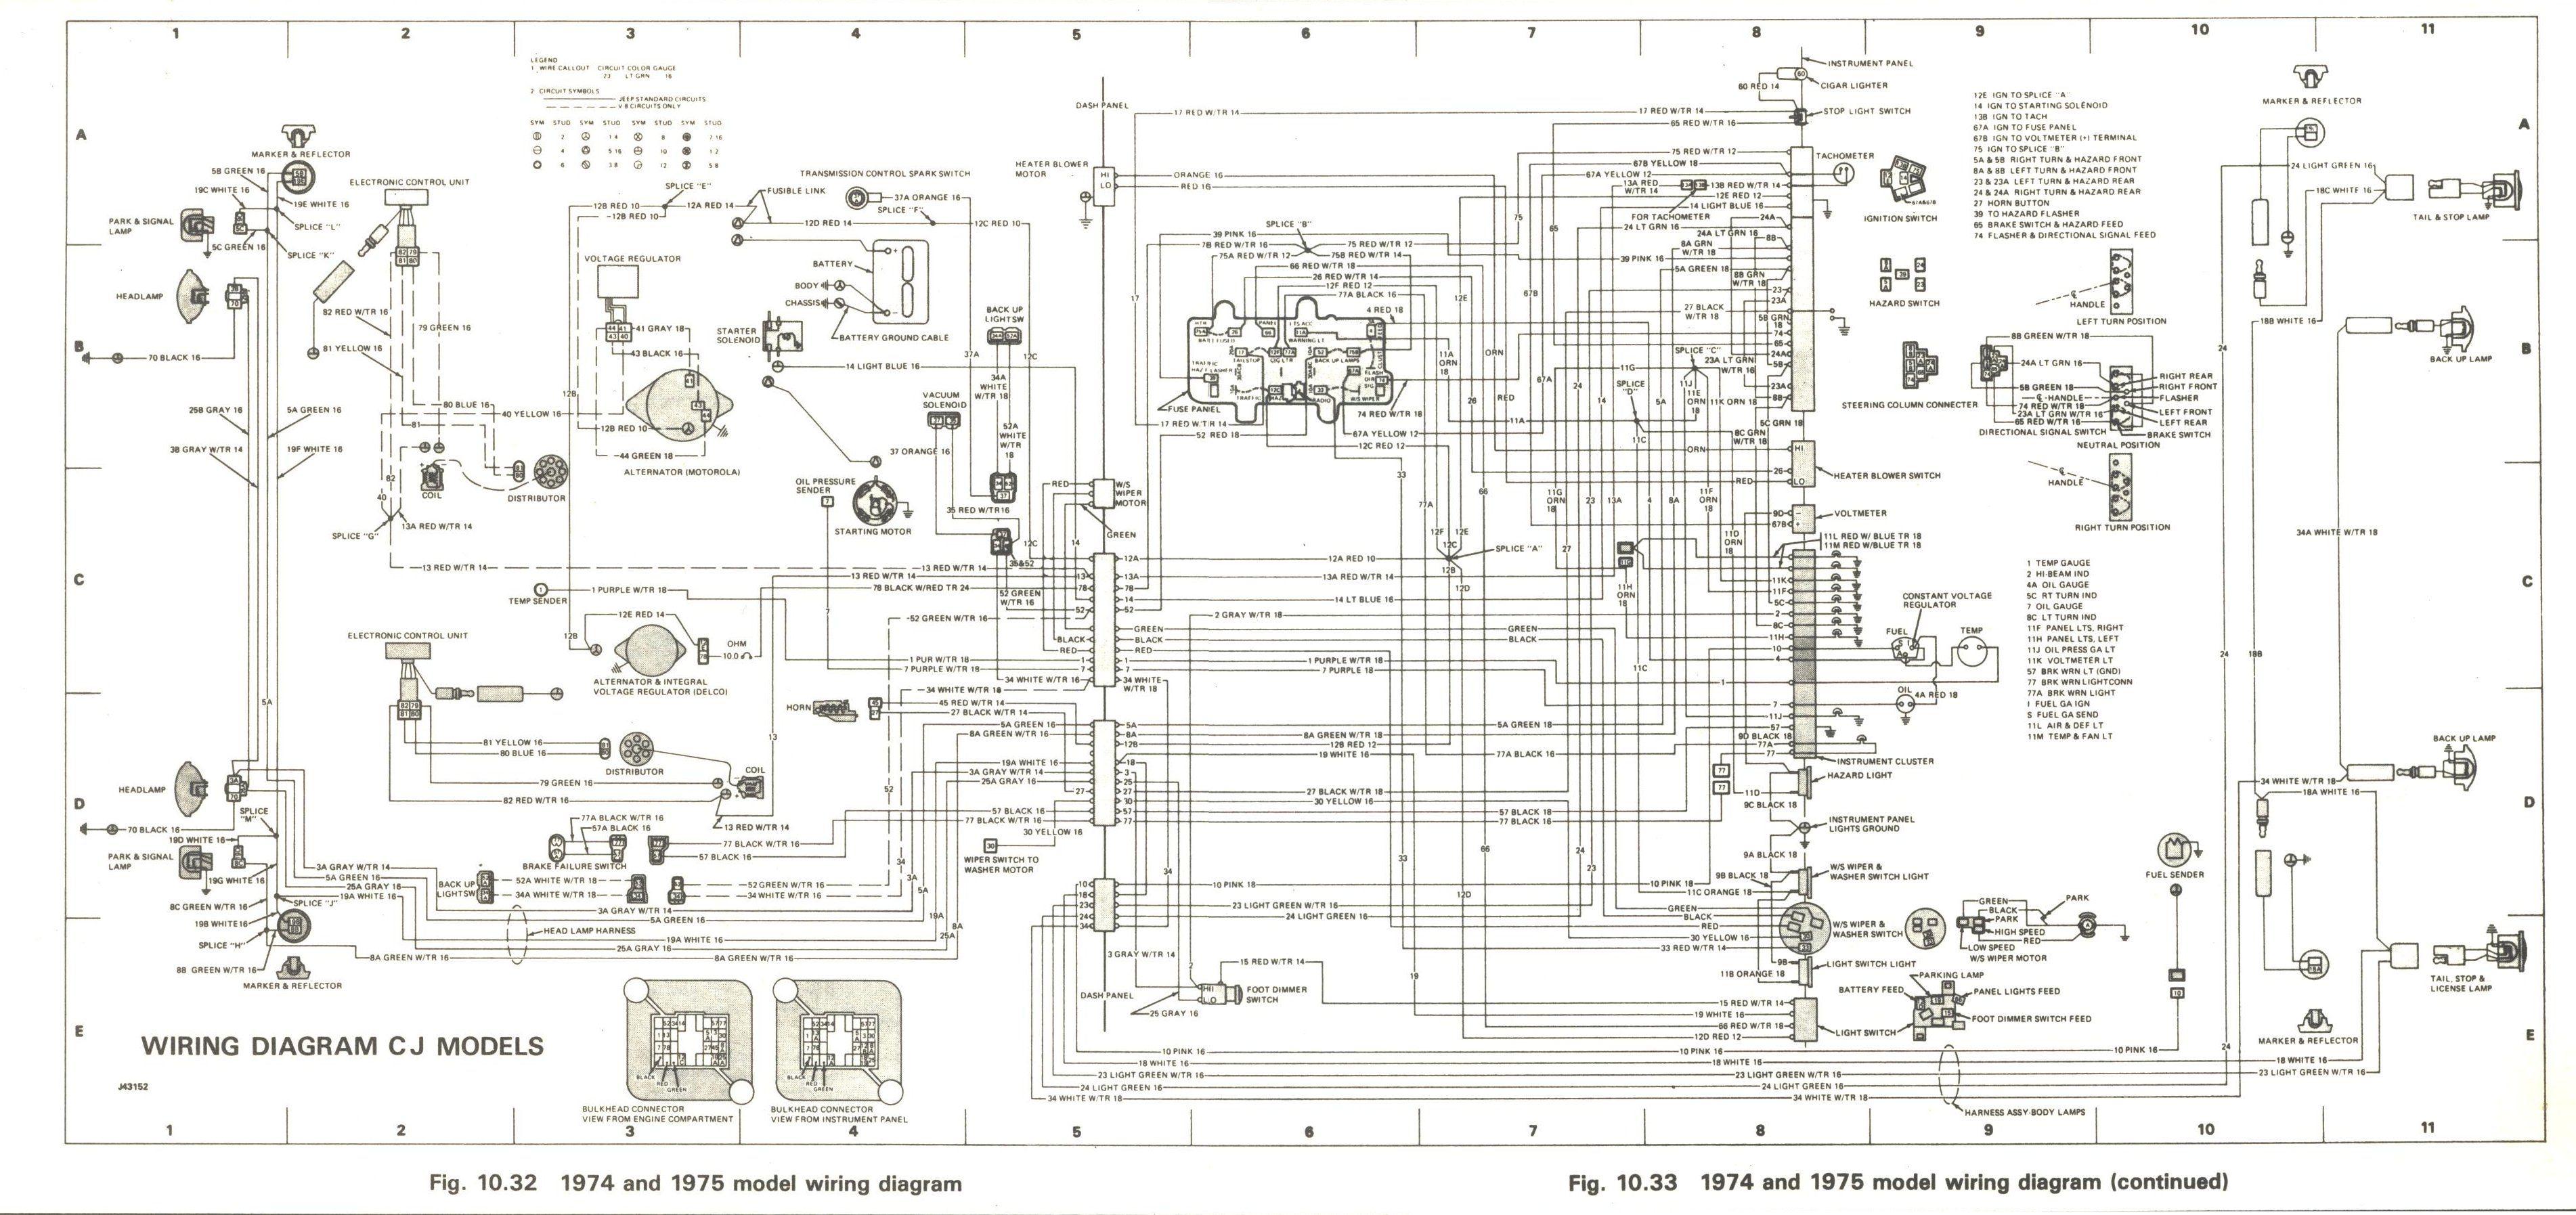 1980 Jeep Cj5 Dash Wiring Diagram | Wiring Library